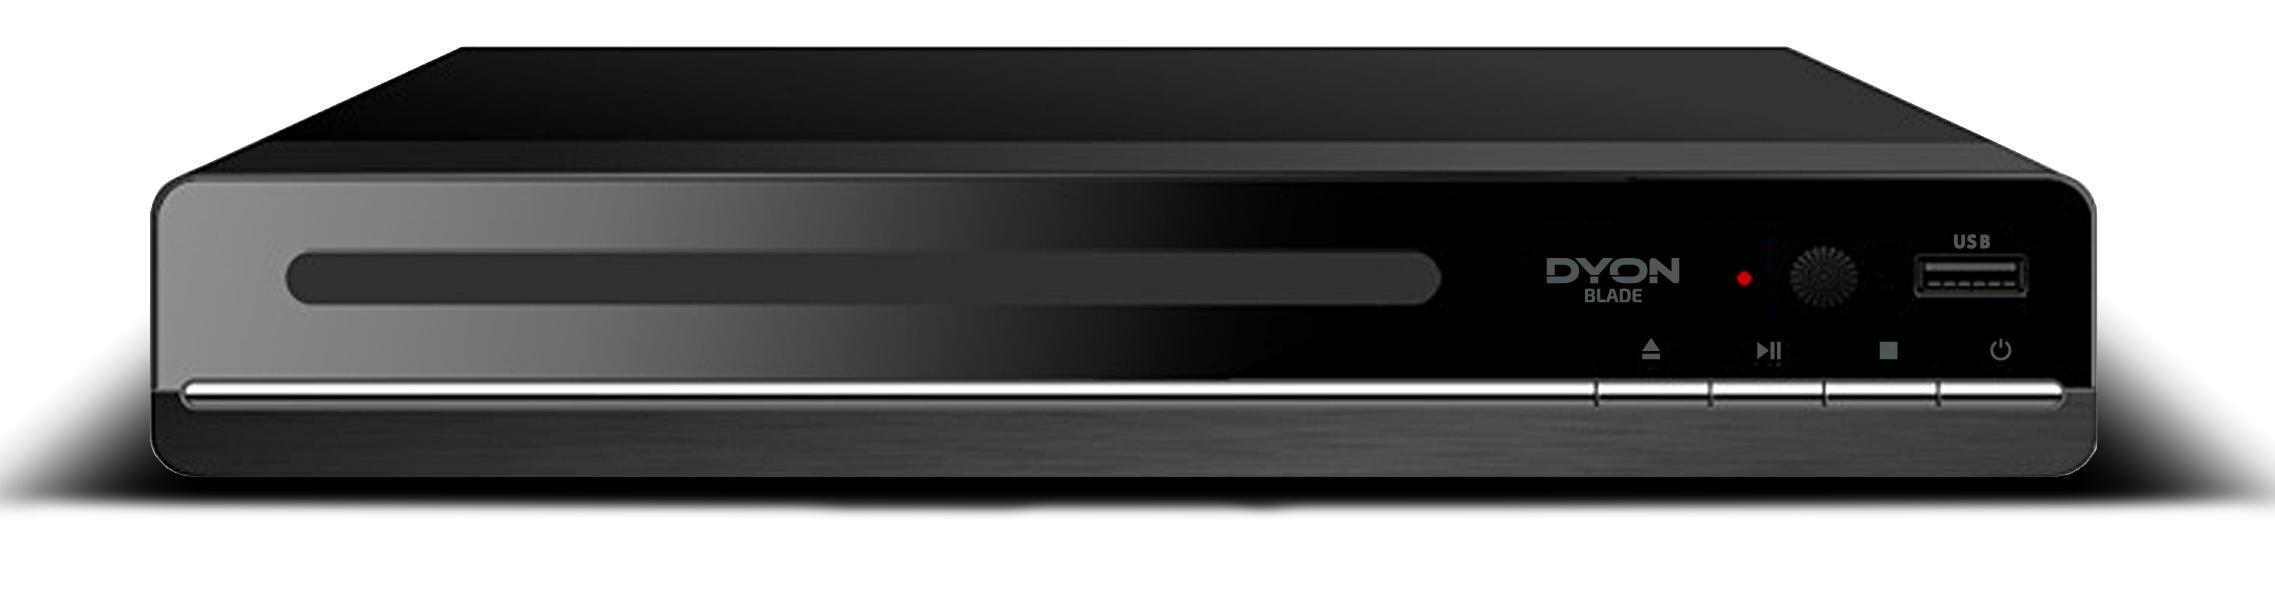 dyon d810014 blade dvd player mit hdmi und usb. Black Bedroom Furniture Sets. Home Design Ideas